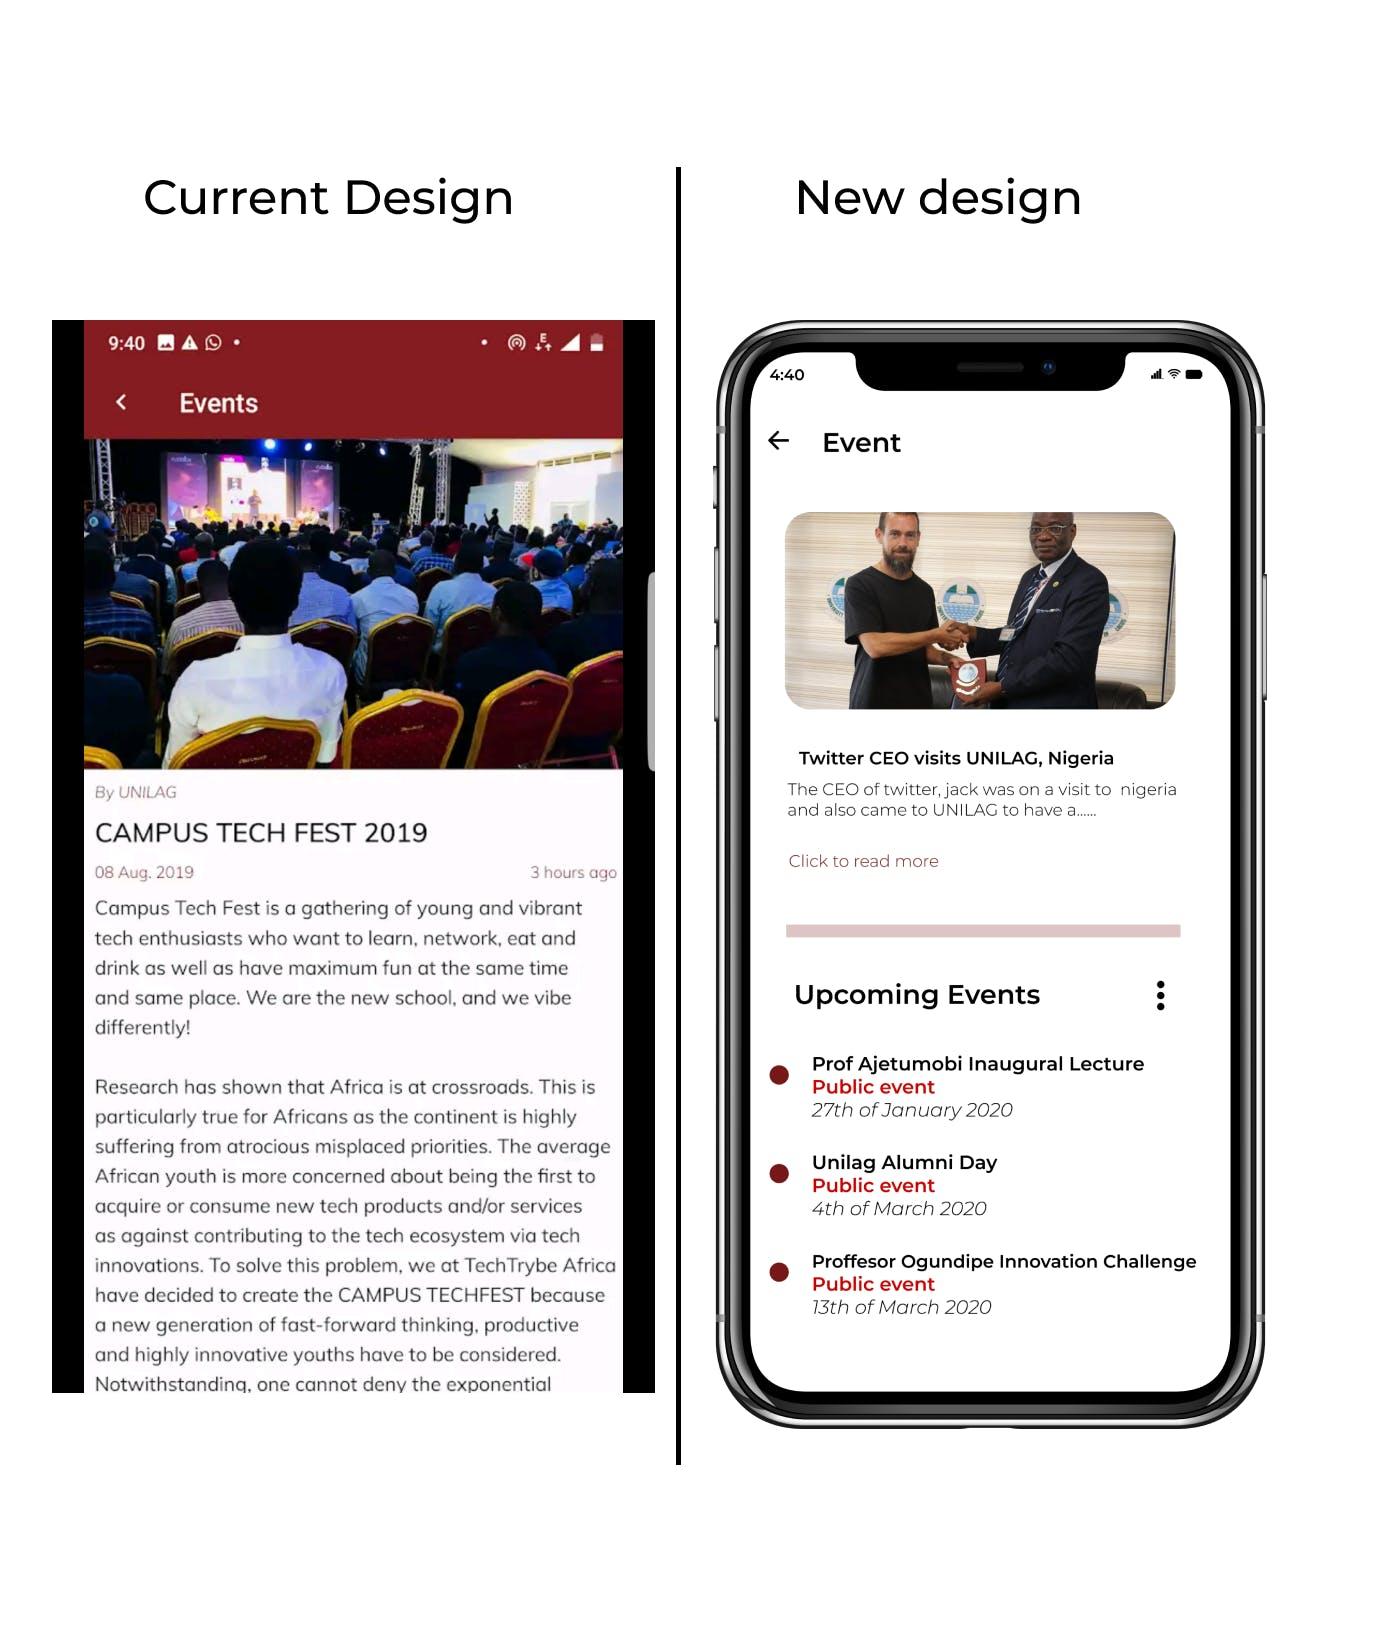 Present google play store app VS My new design